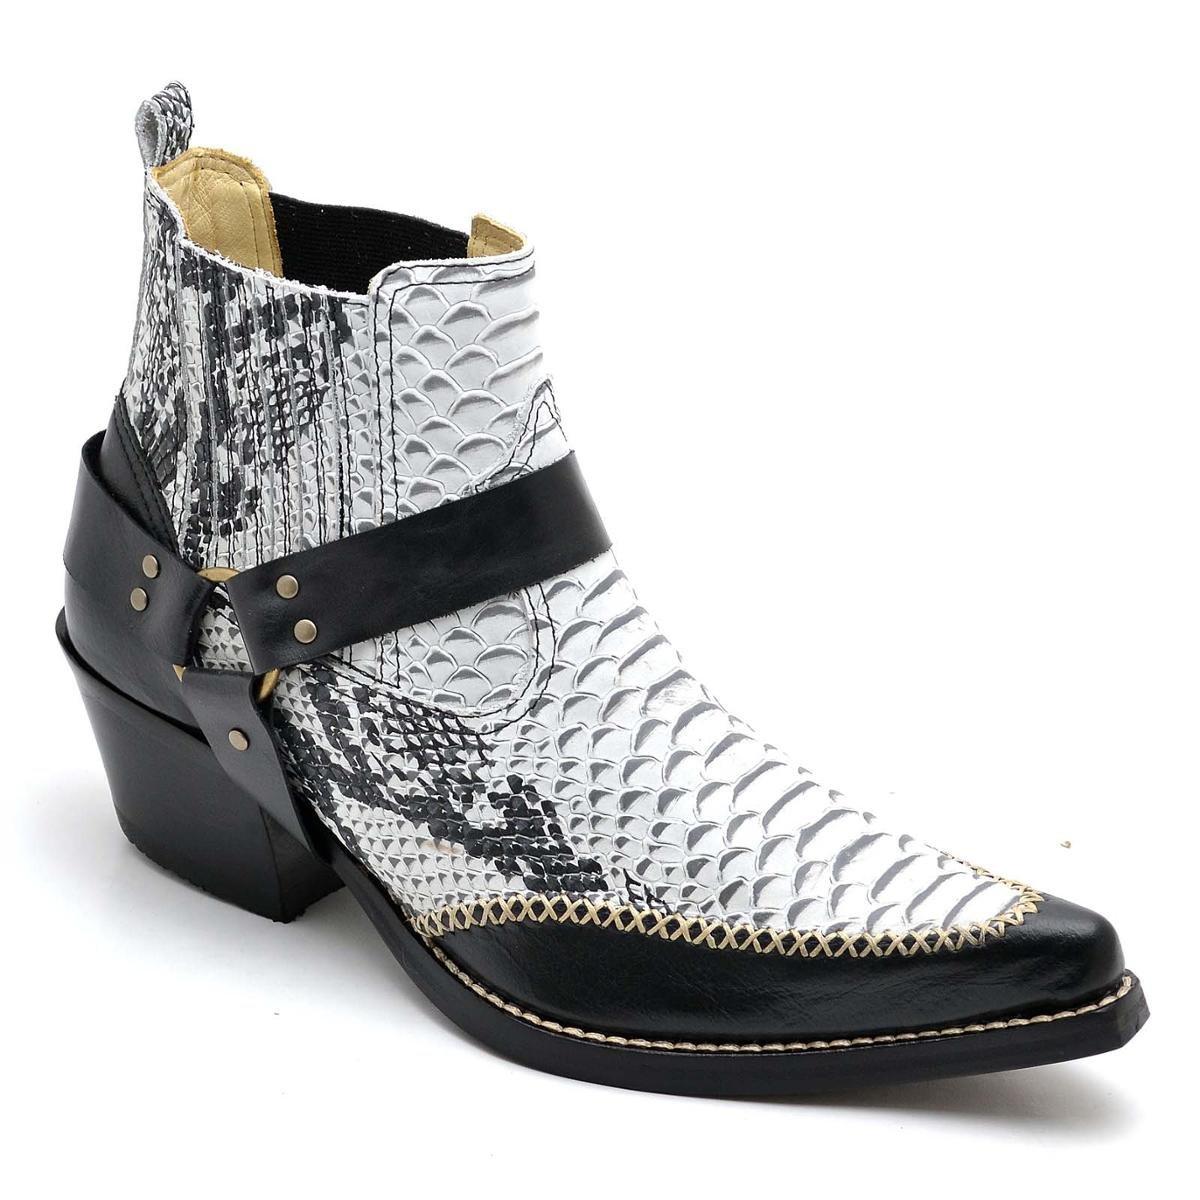 3f14d5ac7f Bota Top Franca Shoes Country Bico Fino Anaconda Masculina - Preto e Branco